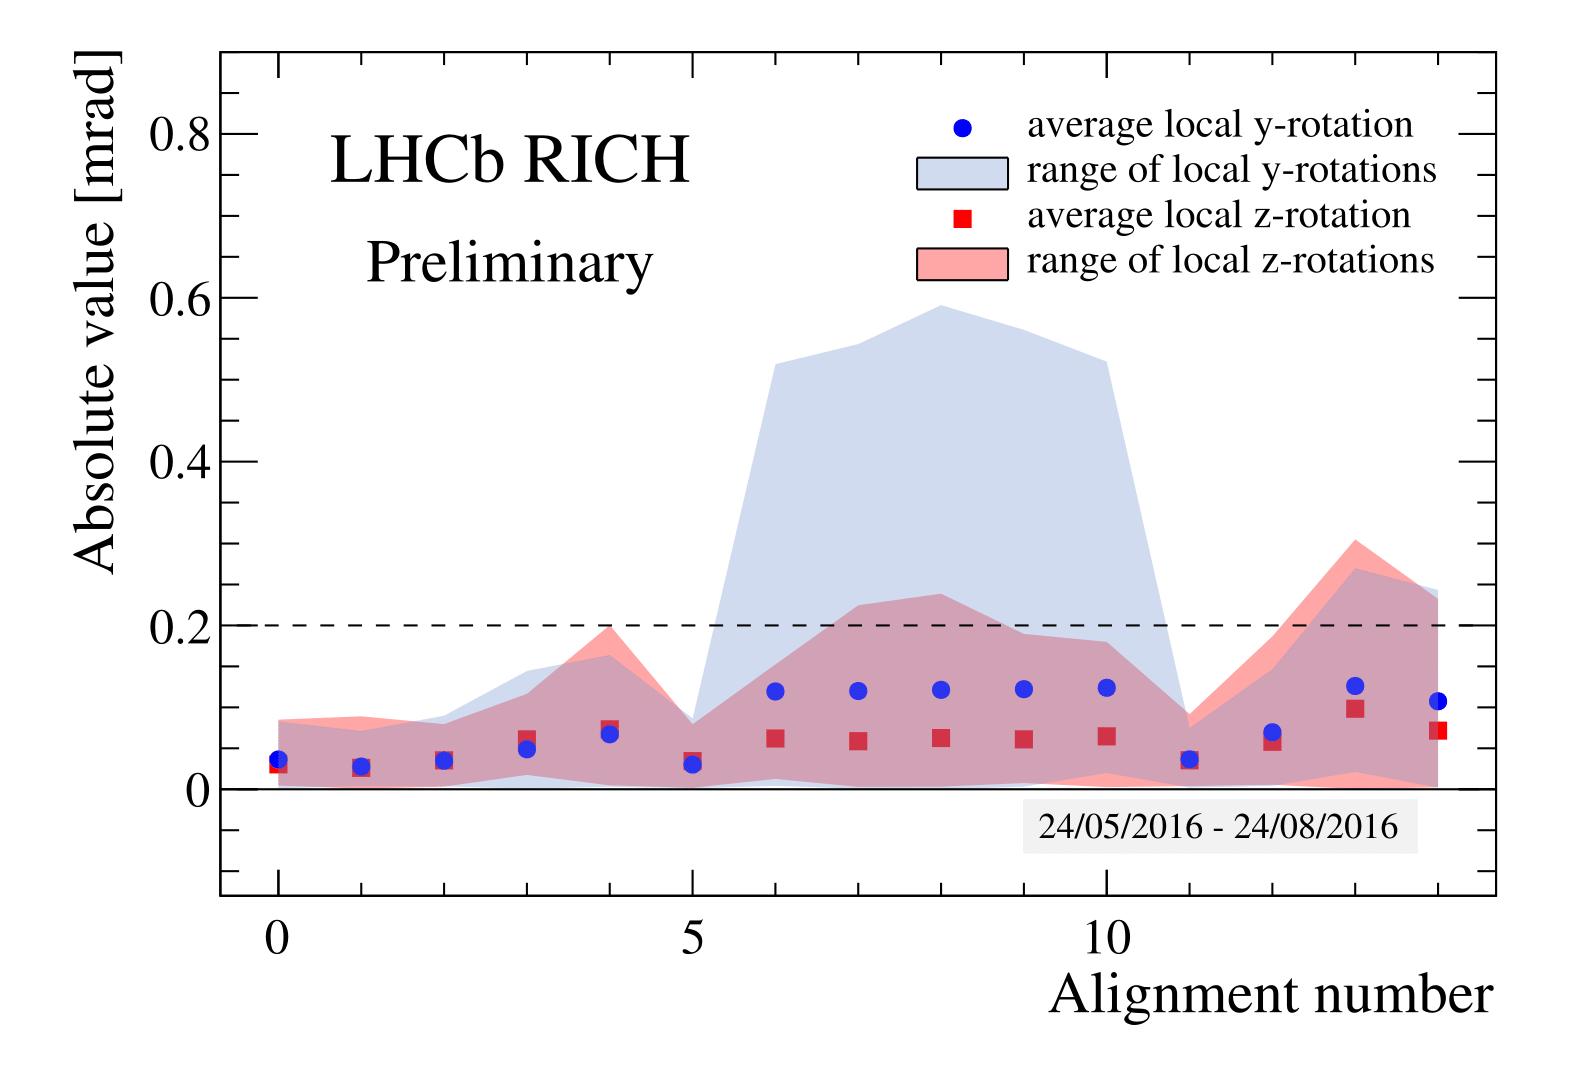 Rich1_absav_range.2-1.png